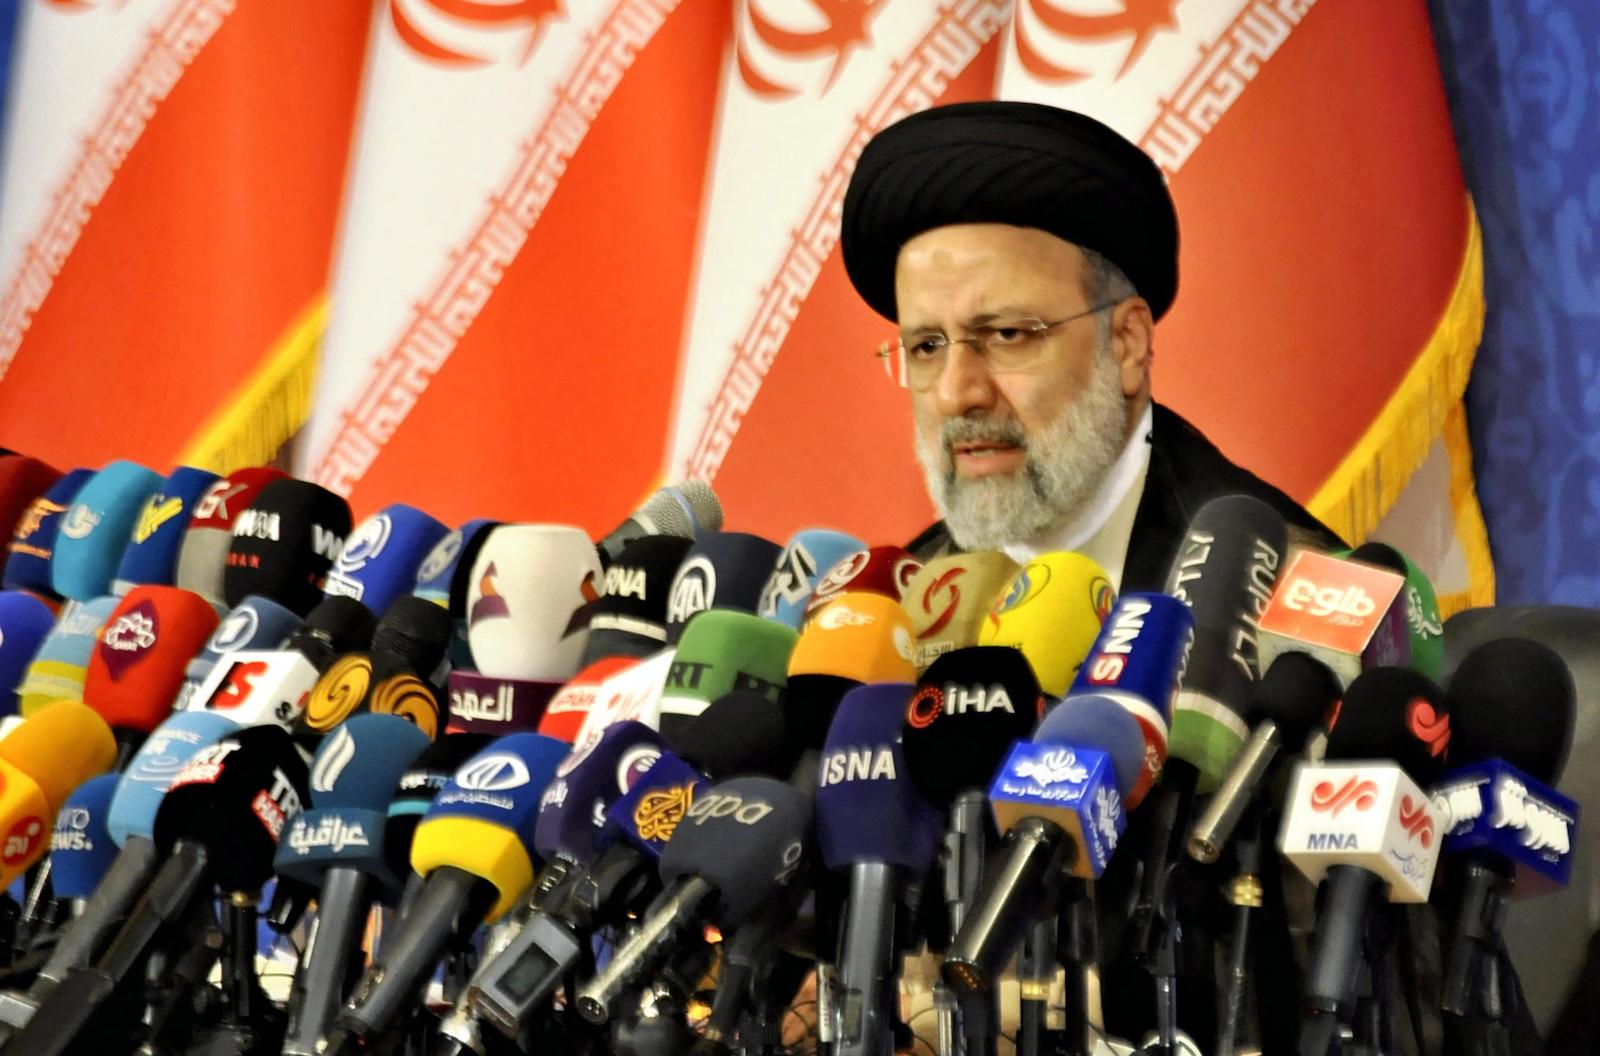 Iran's new President-elect Ebrahim Raisi holds a press conference in Tehran on June 21. Photo: AFP / Shota Mizuno / The Yomiuri Shimbun